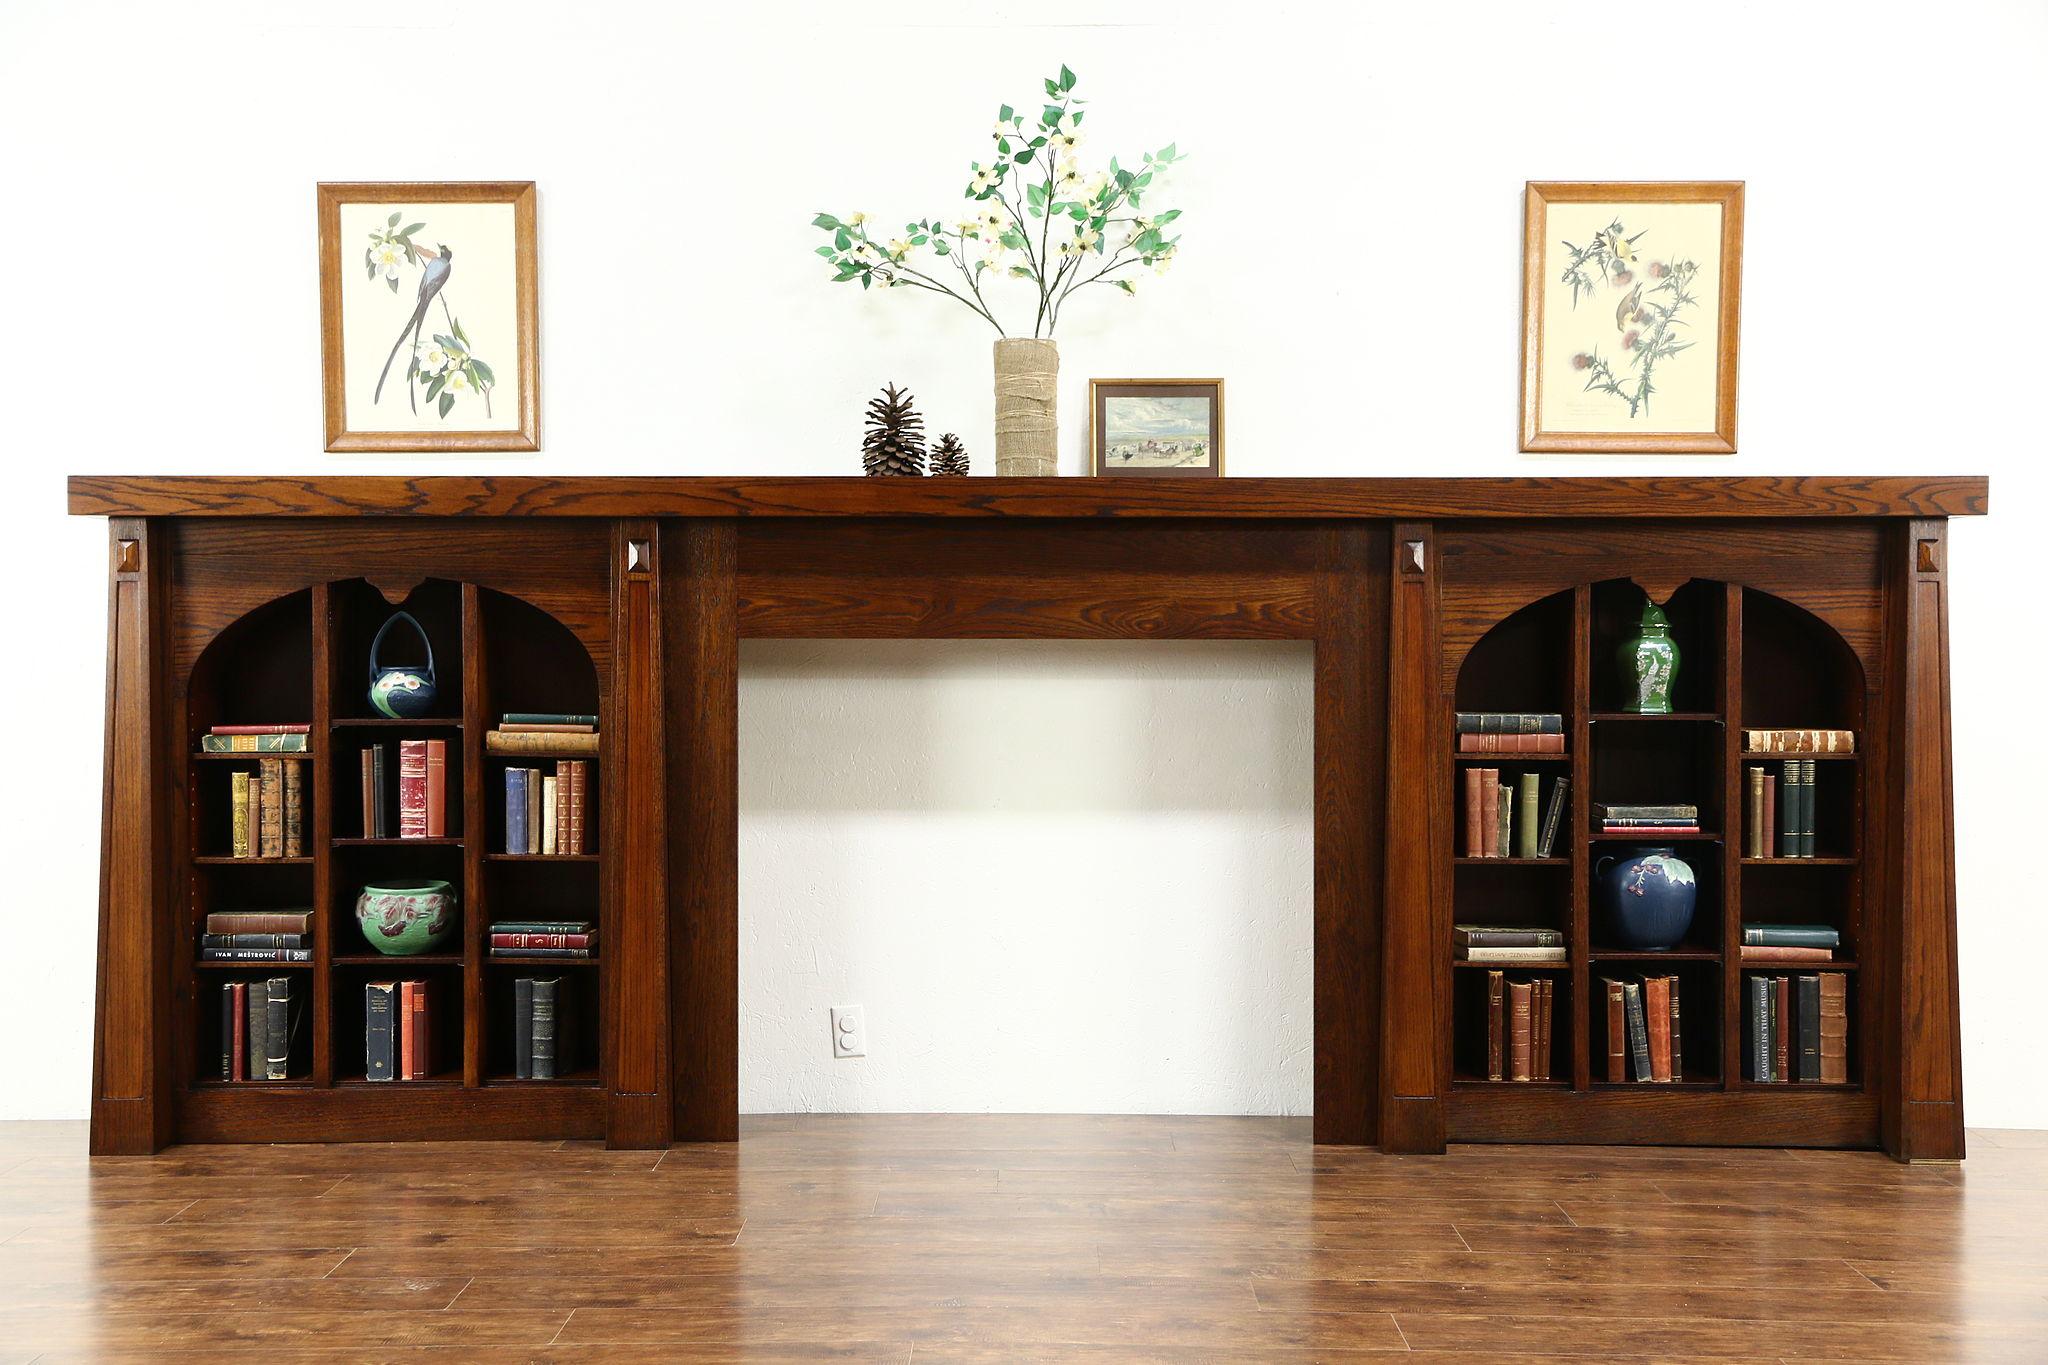 arts u0026 crafts antique fireplace mantel u0026 bookshelves salvage wall - Antique Fireplace Mantels